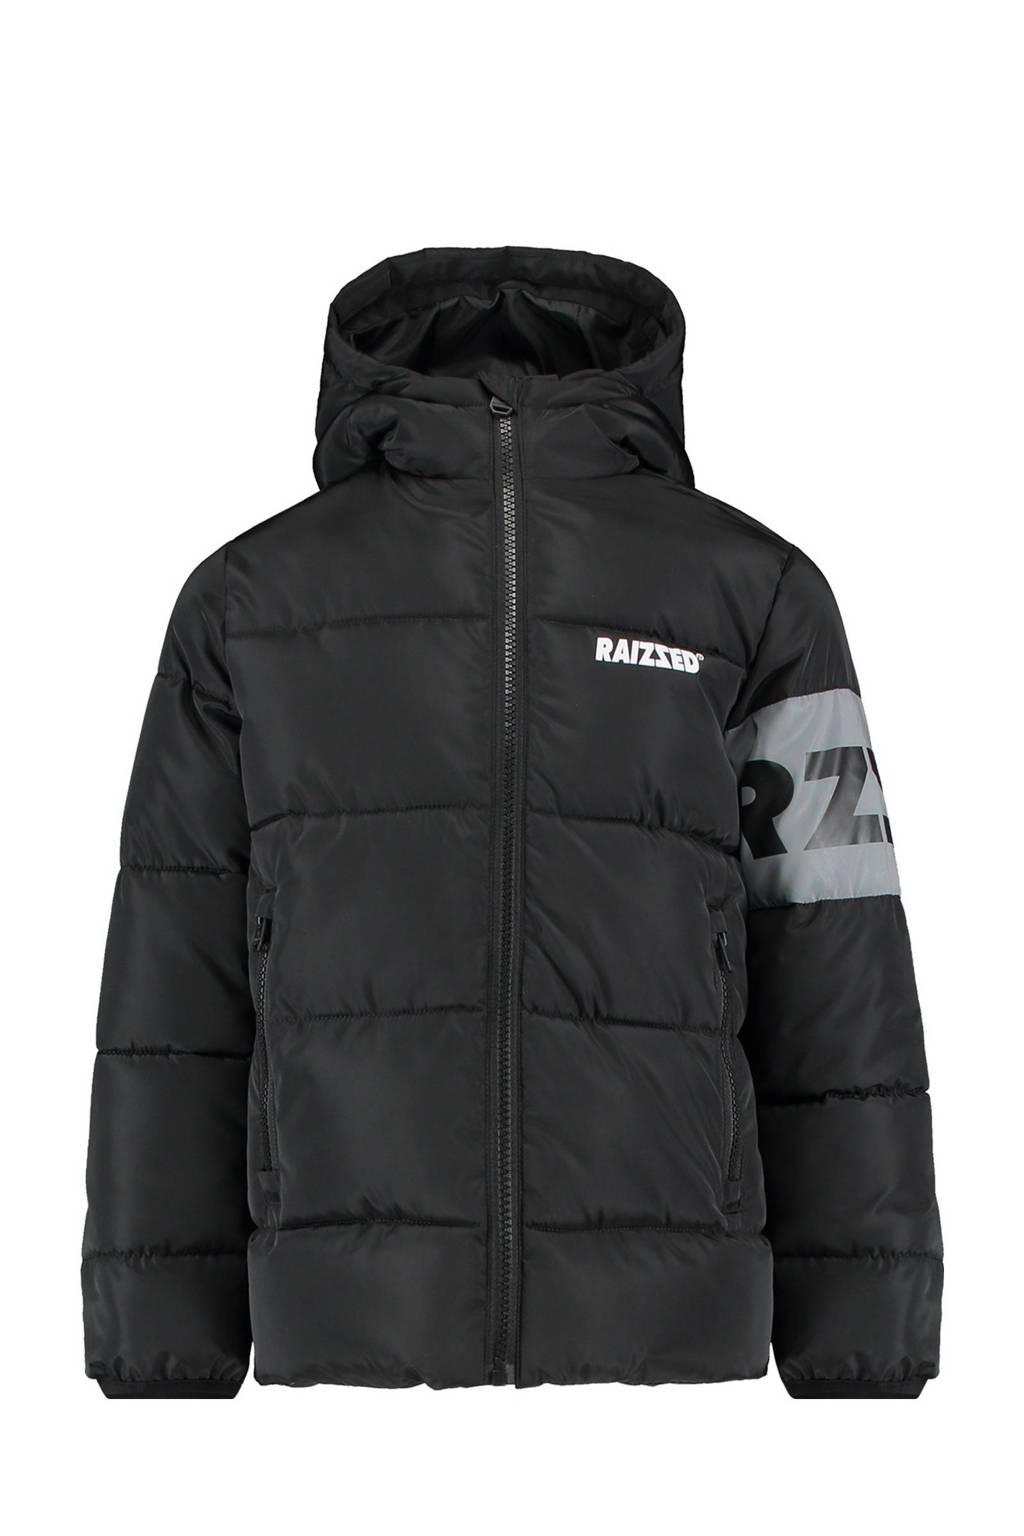 Raizzed  winterjas Tirur met printopdruk zwart, Zwart